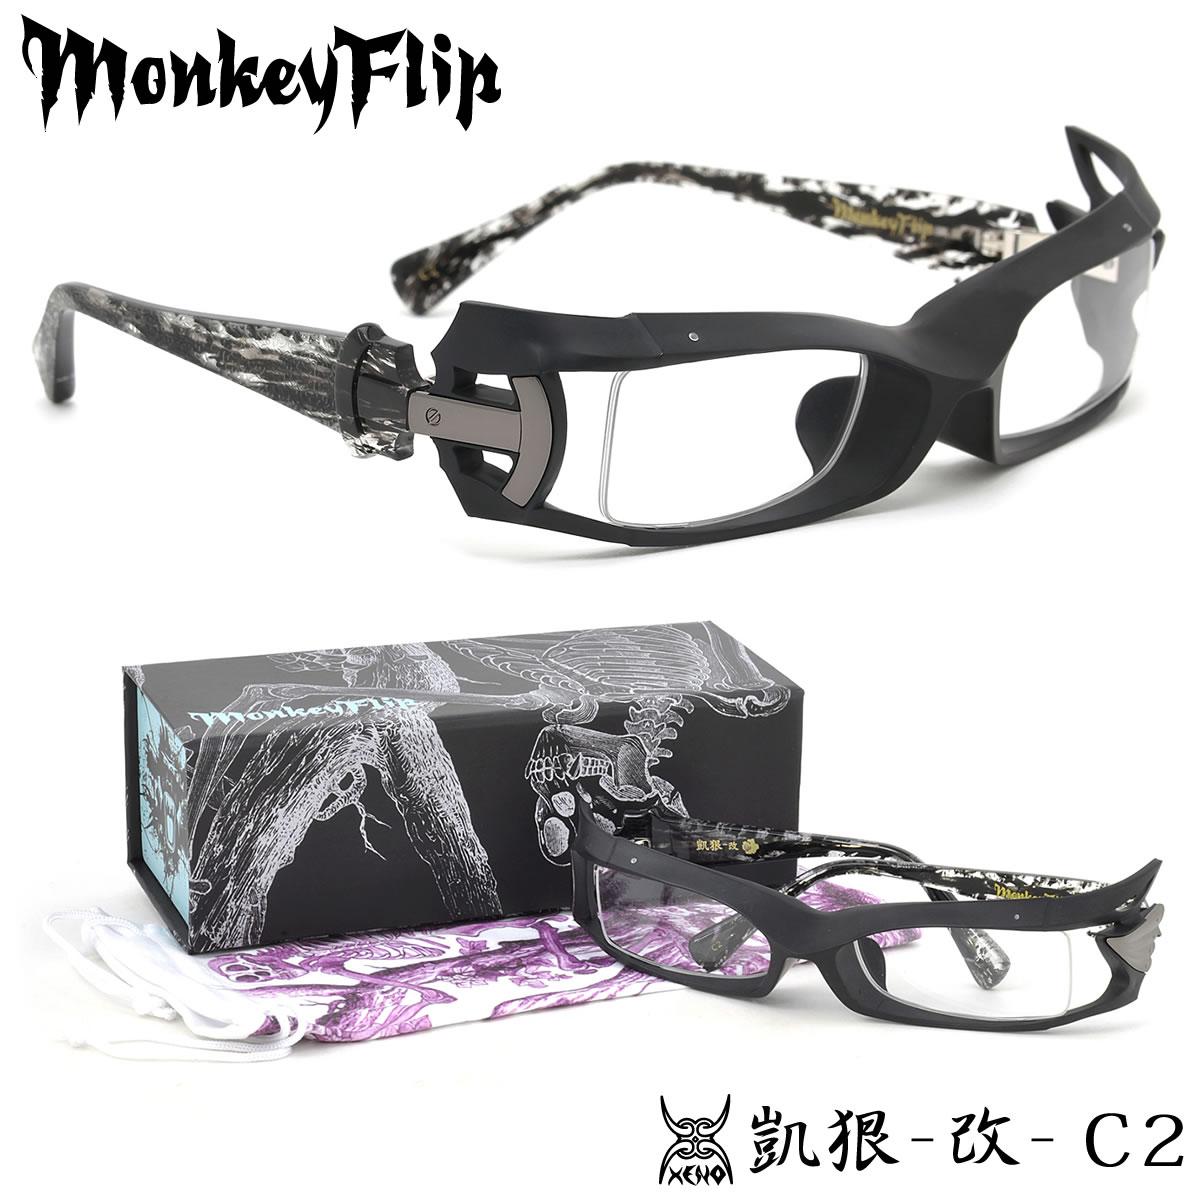 【Monkey Flip】(モンキーフリップ) メガネ 凱狠改 C2 57サイズ 凱狠-改- XENO ガイガンカイ ゼノ モンキーフリップ MonkeyFlip メンズ レディース